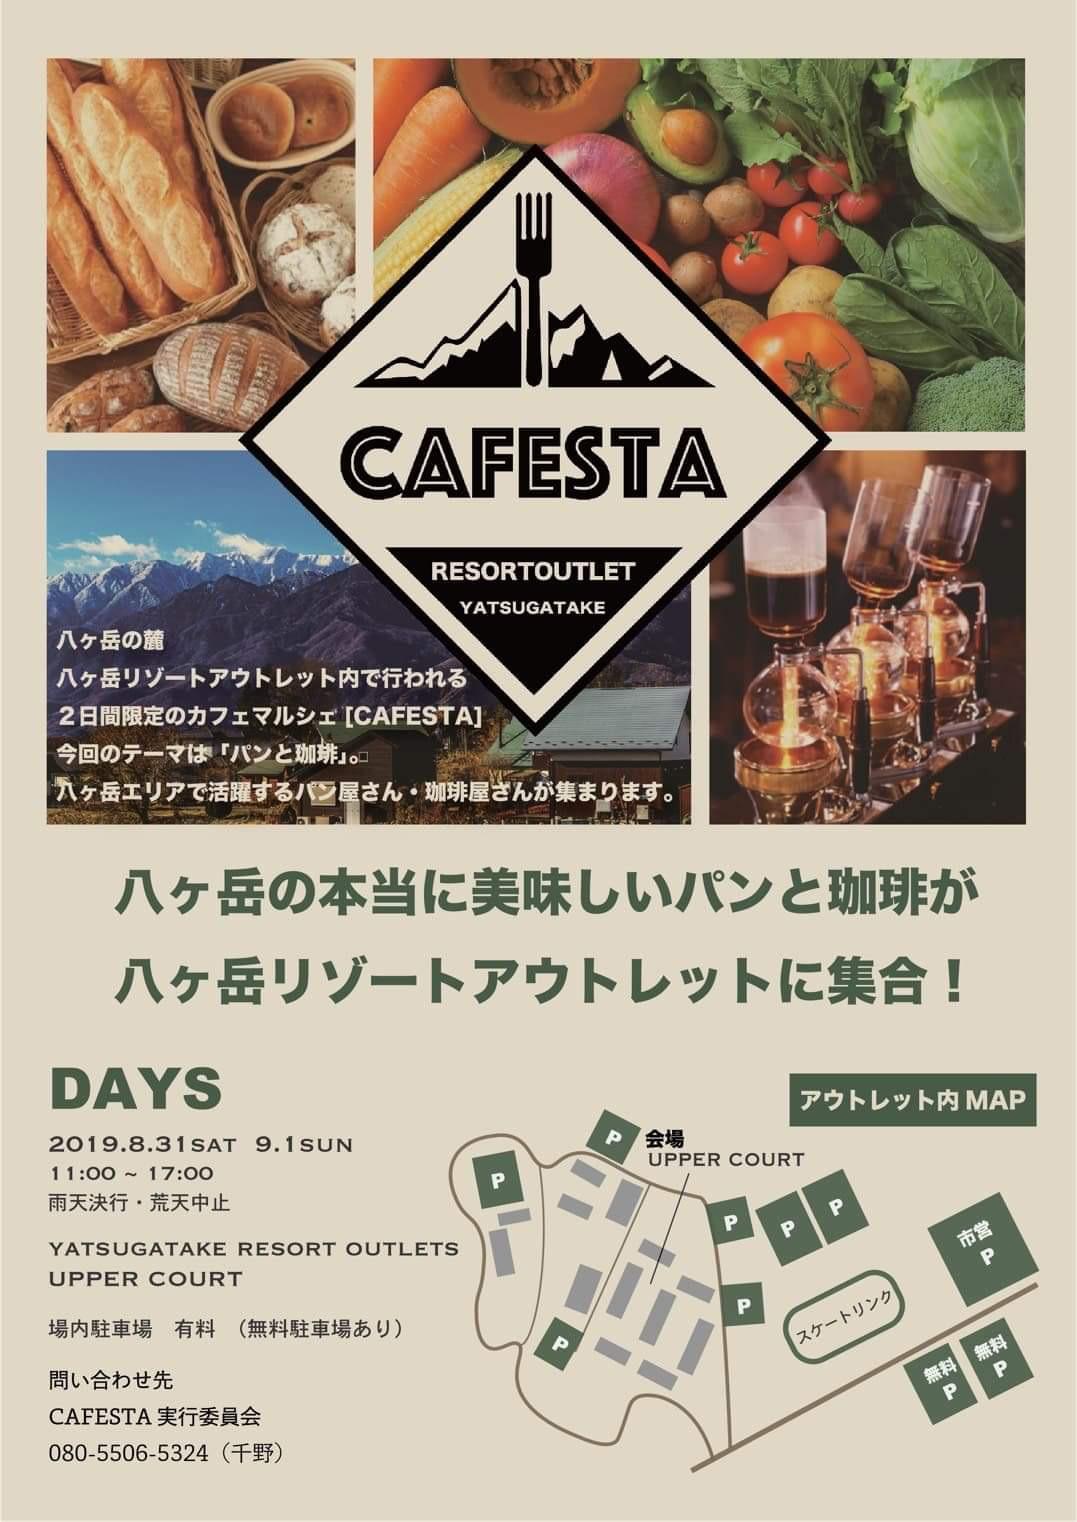 CAFESTA  2019『八ヶ岳のパンと珈琲』開催